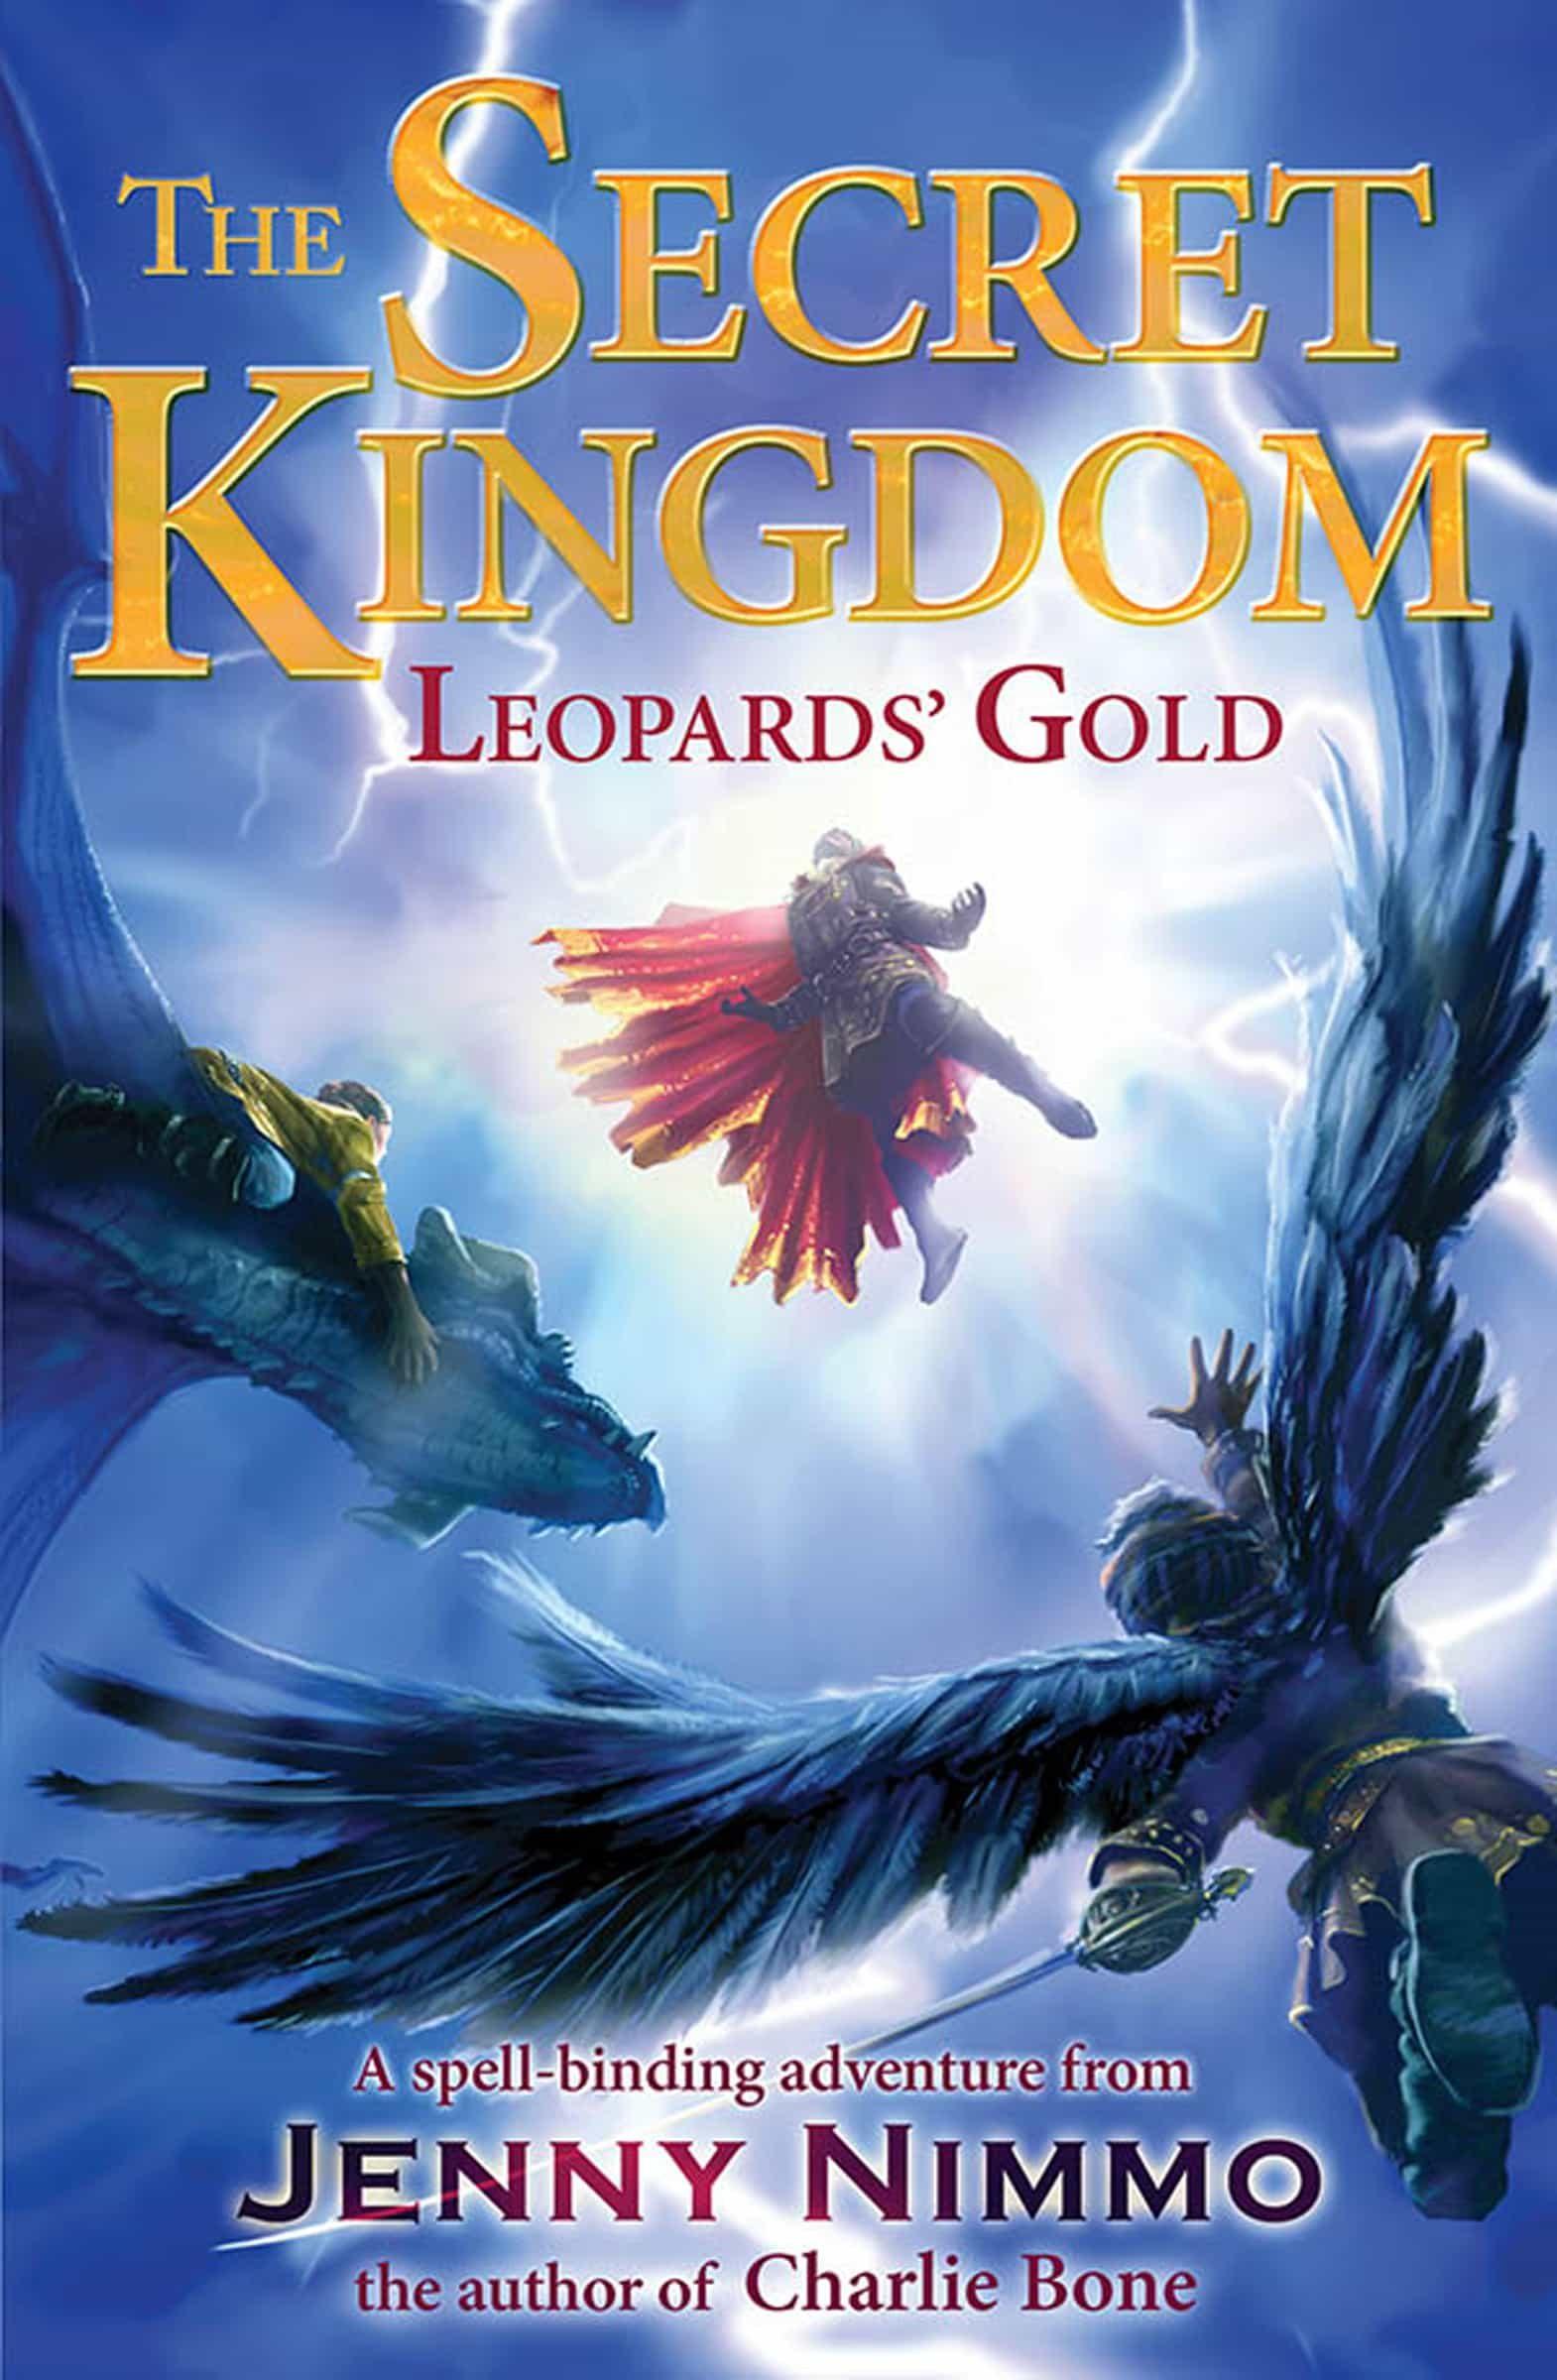 The Secret Kingdom: Leopards' Gold (ebook)jenny Nimmo9781780311876